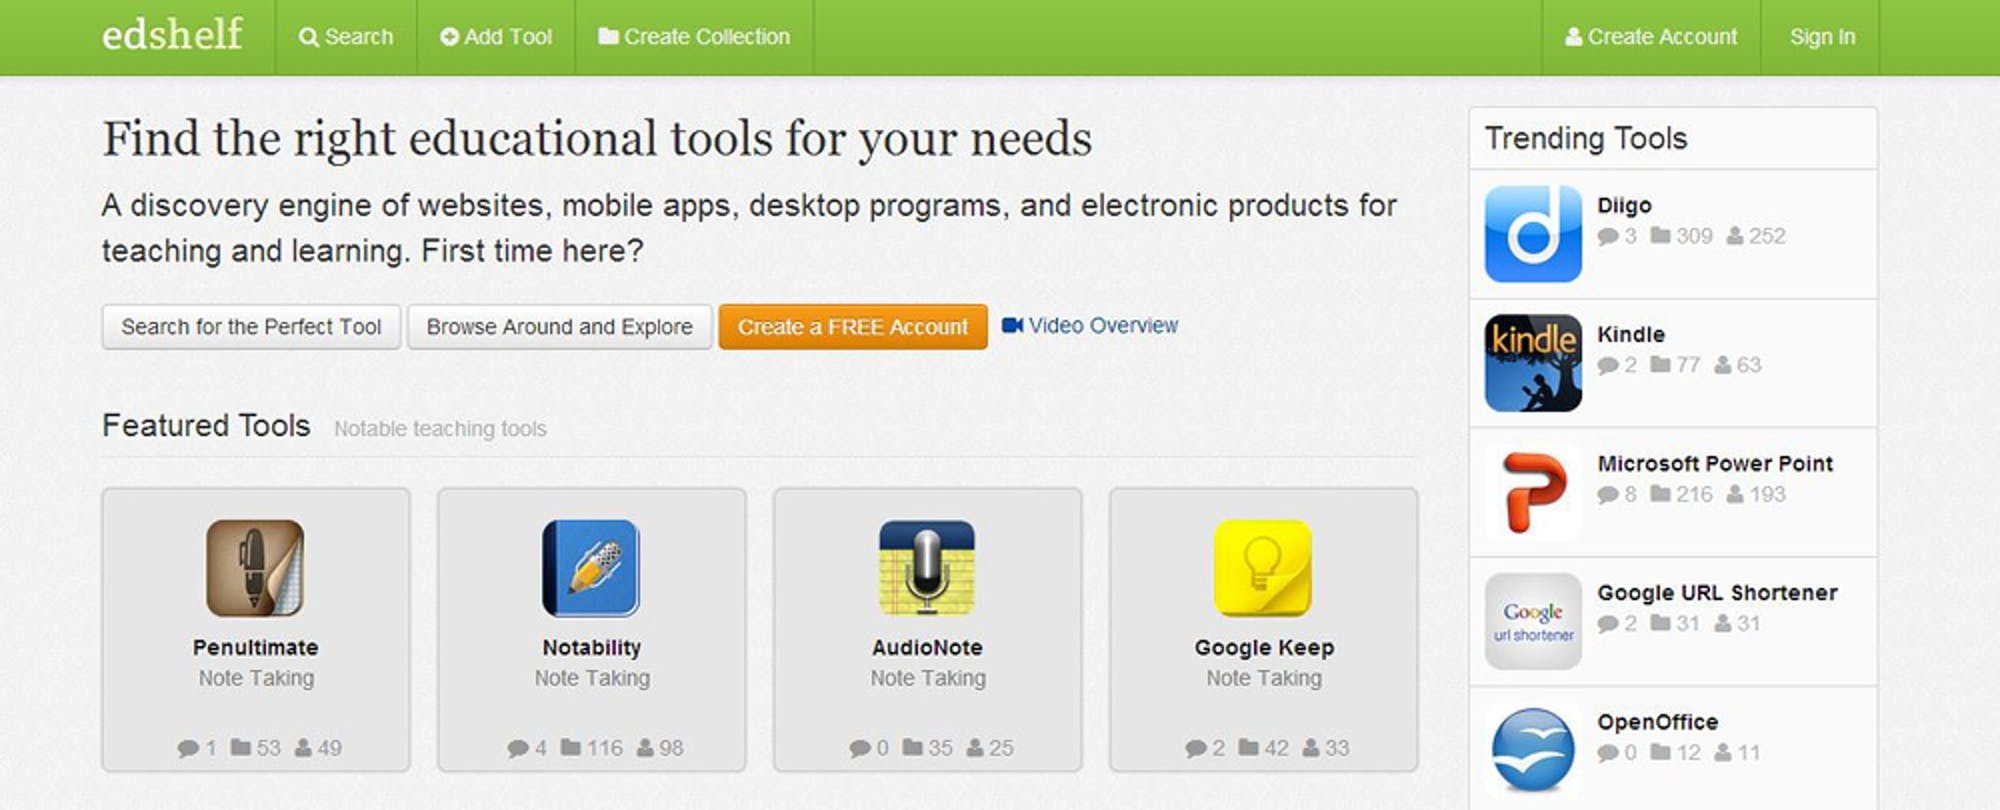 Edshelf, a Review Directory for Education Apps, Closes Shop